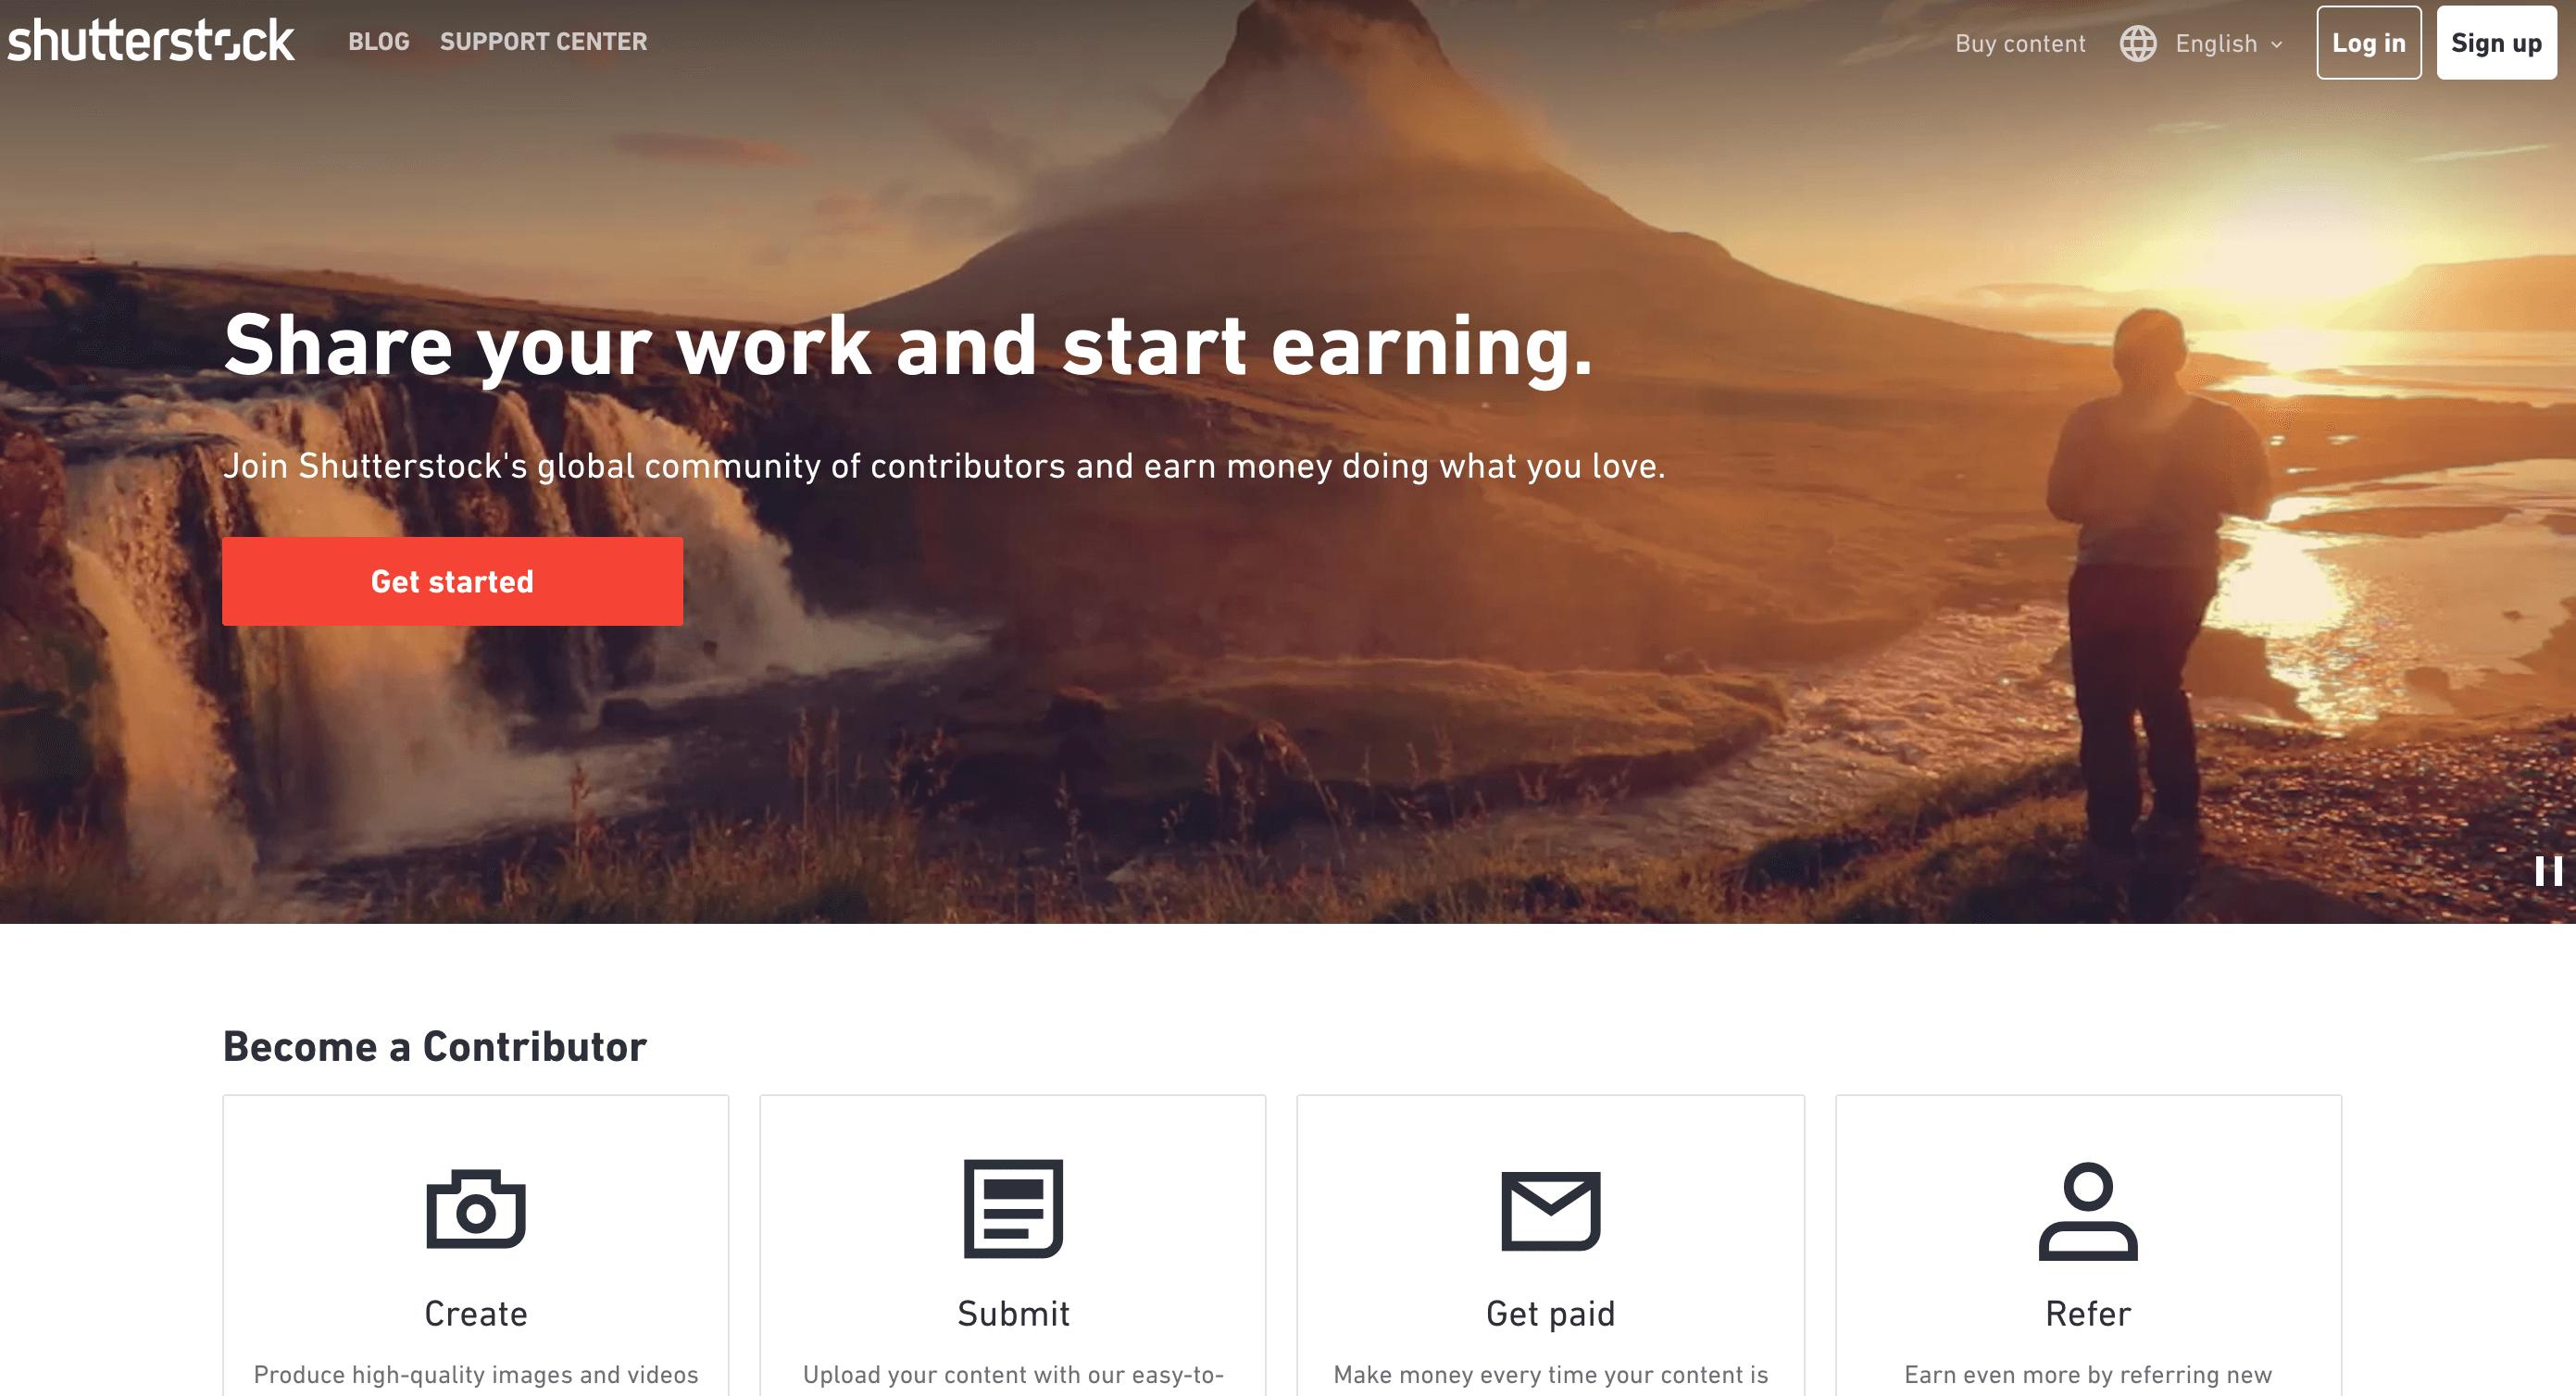 shutterstock earn money for selling content